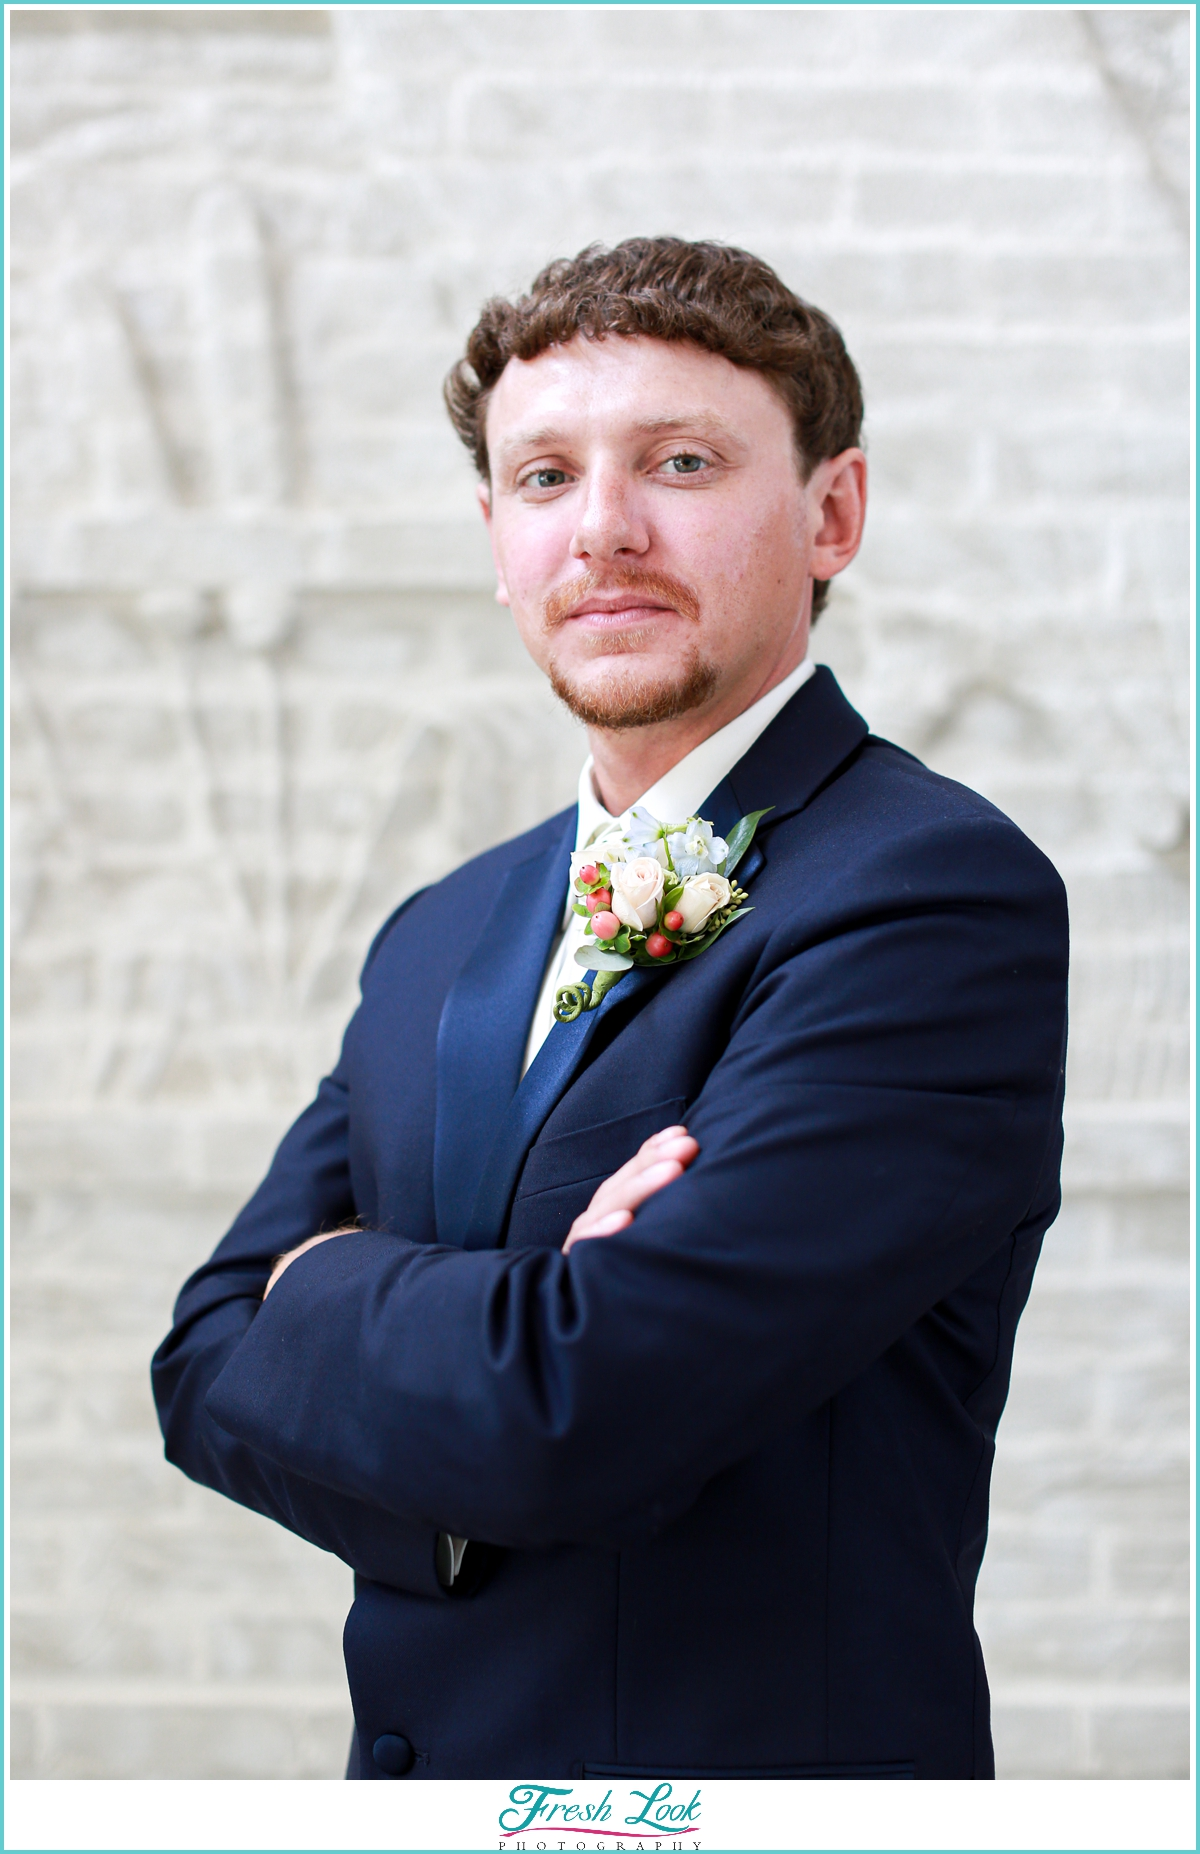 handsome groom portrait idea